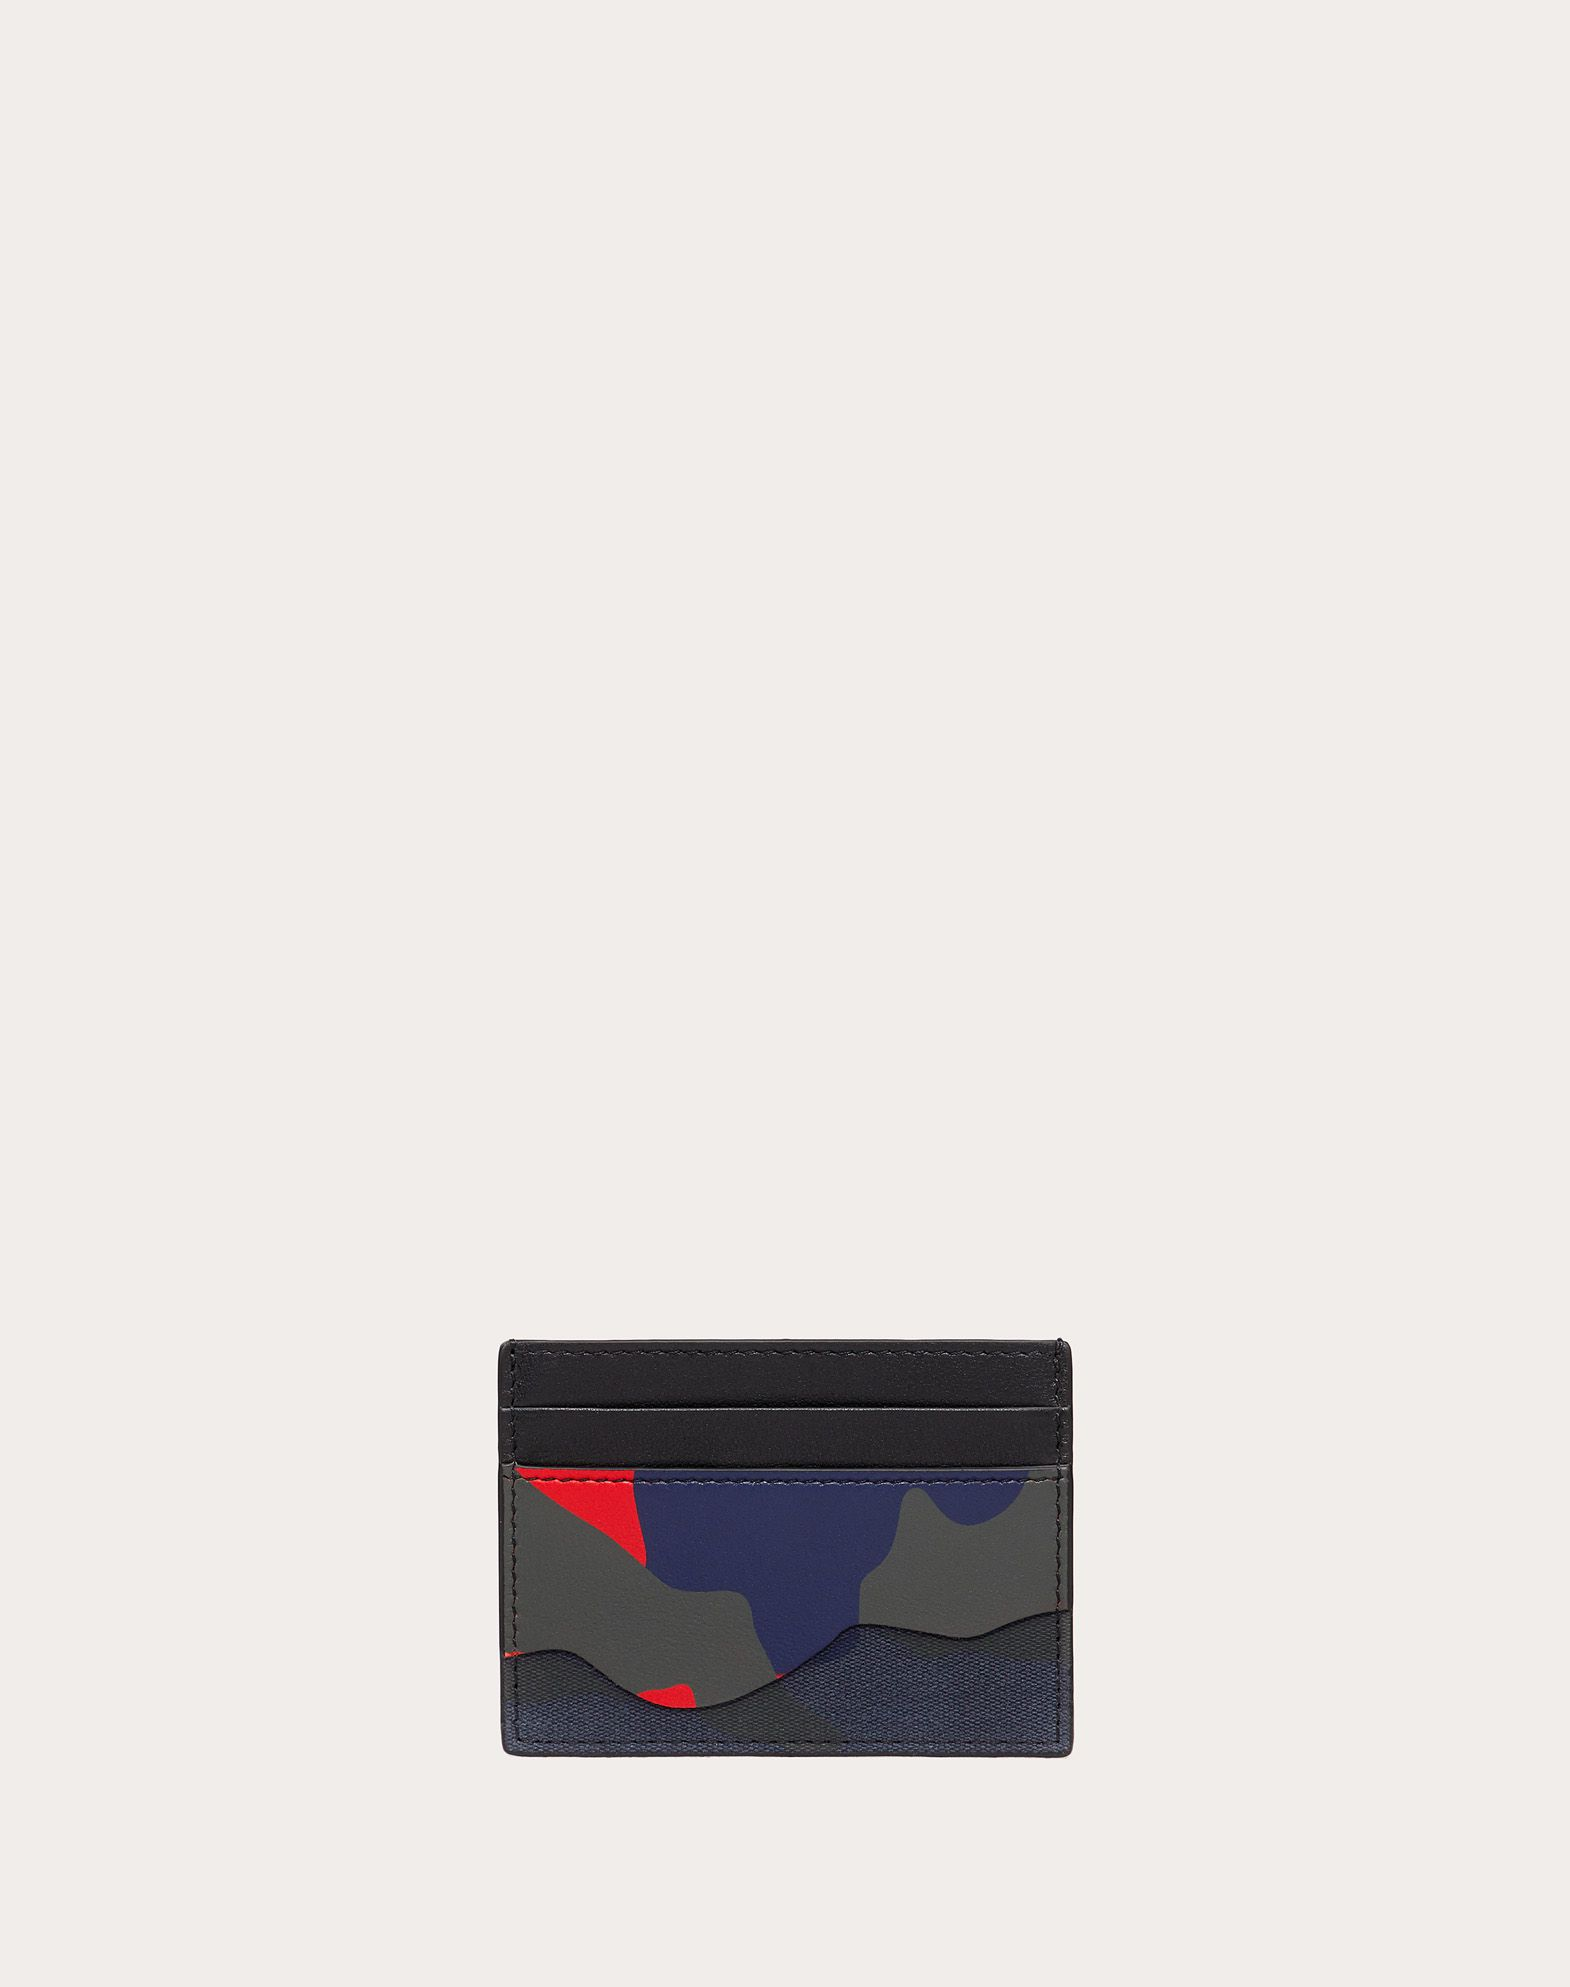 Camouflage cardholder